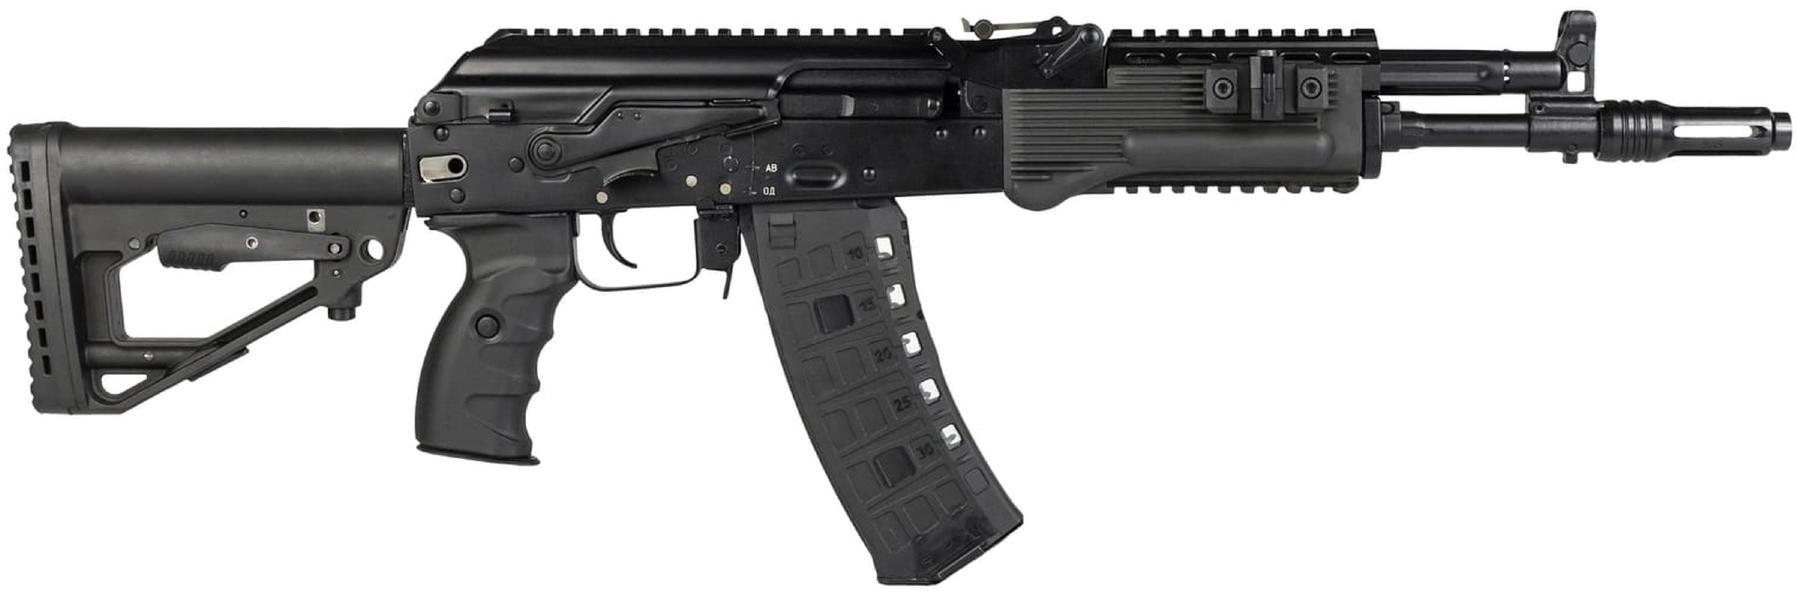 AK-205